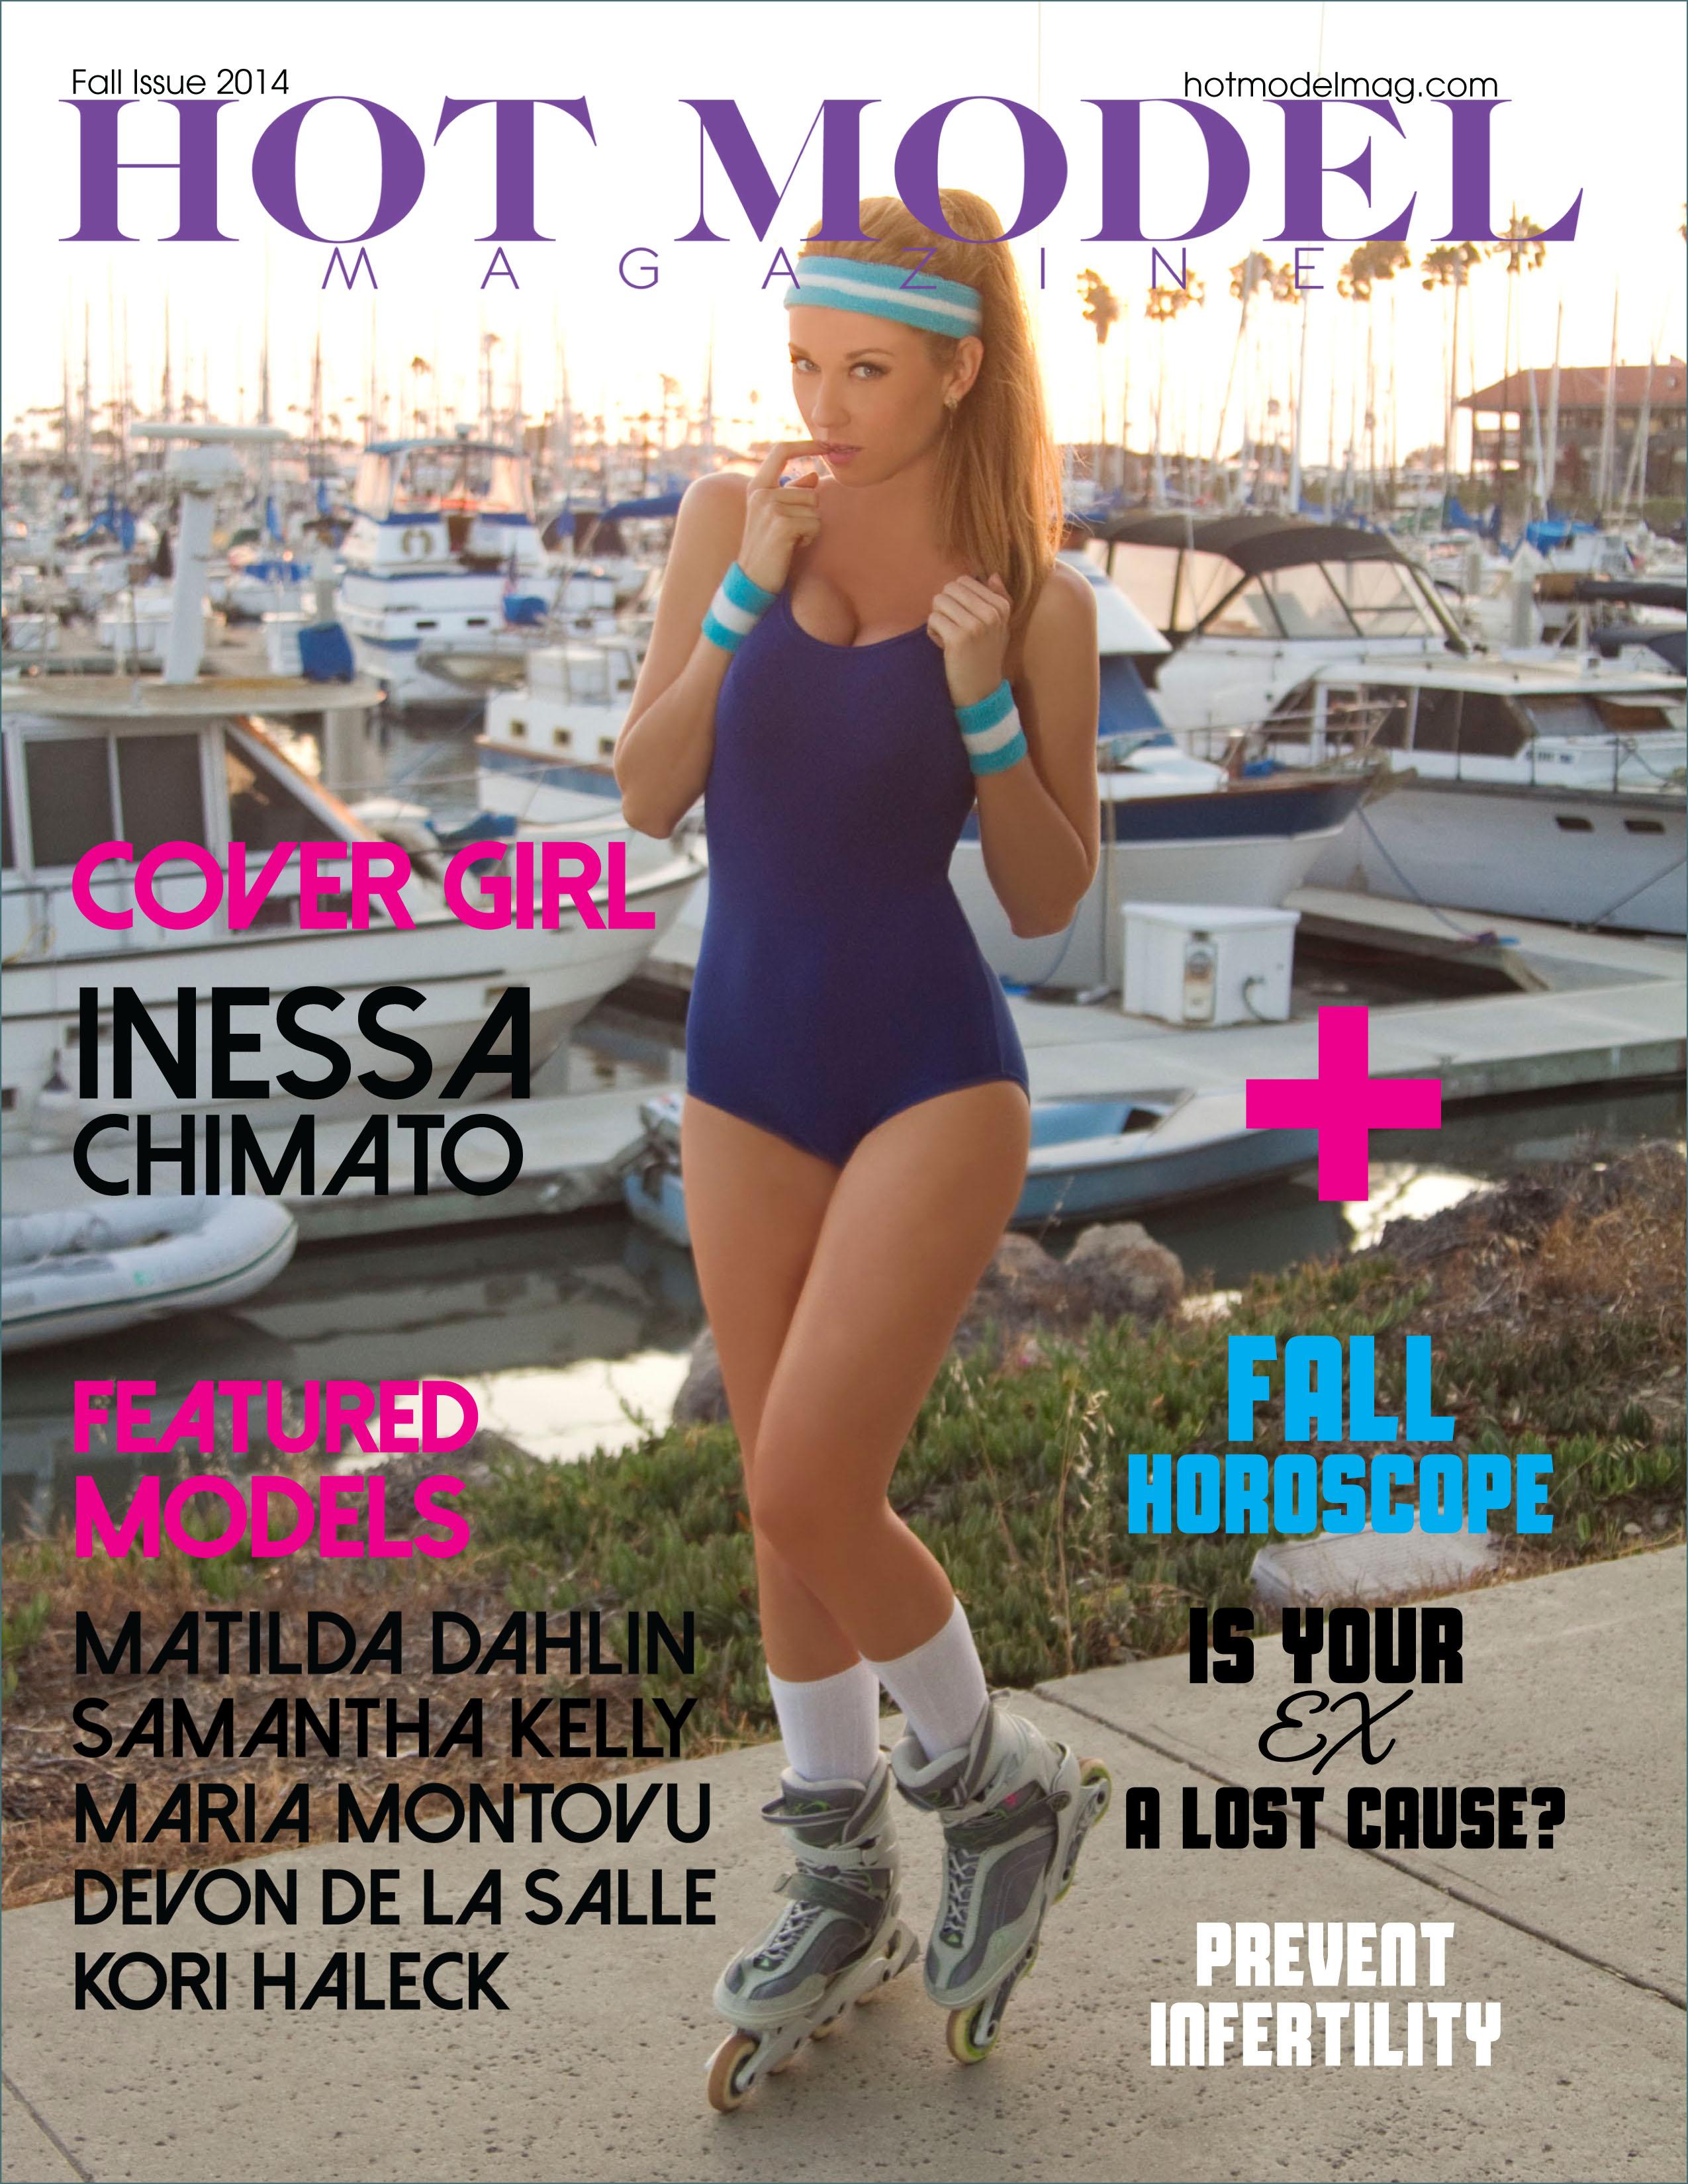 Hot Model Magazine Fall Issue